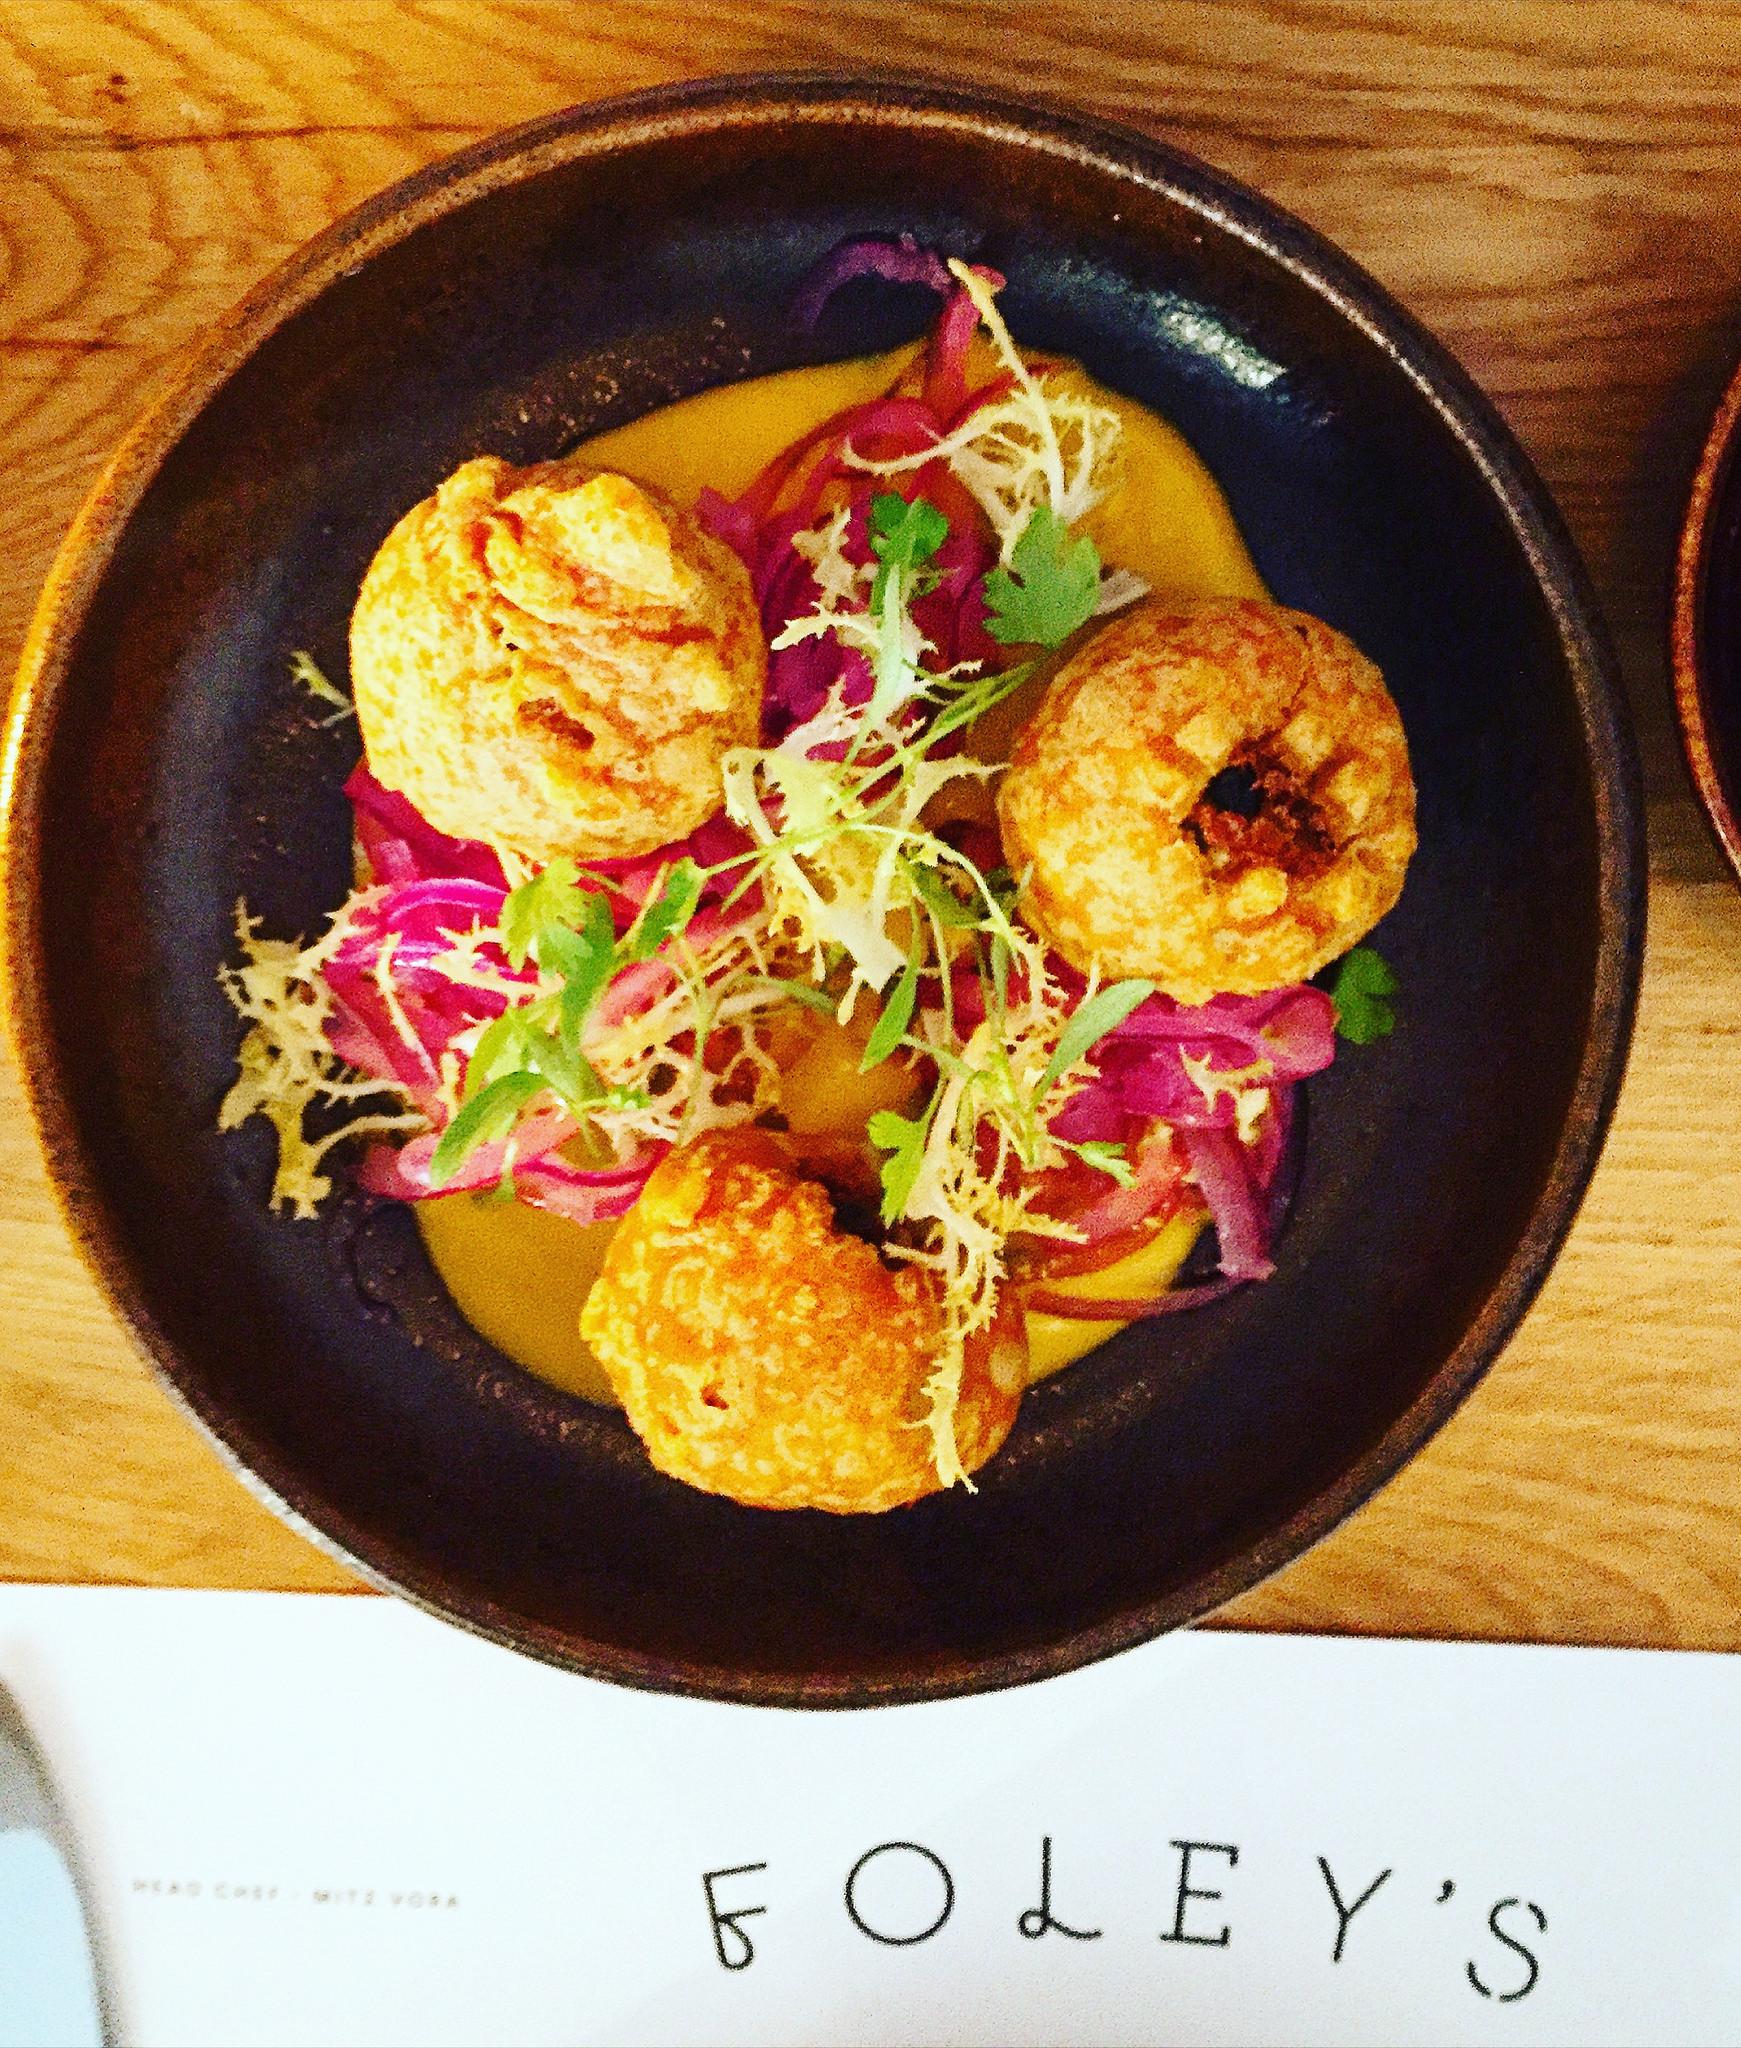 Foley's - Best new restaurants 2016